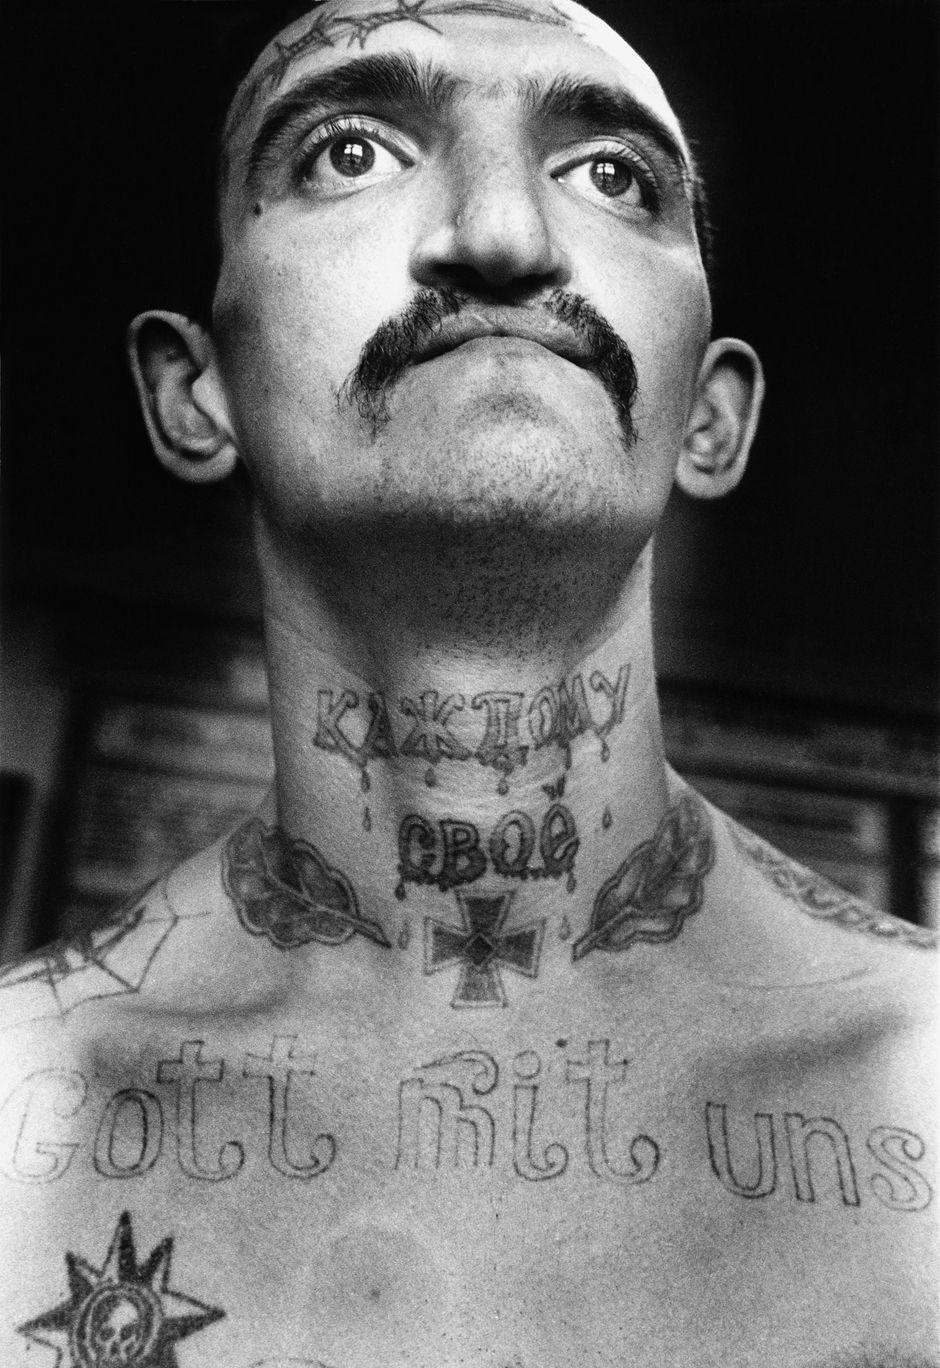 tatouage-encyclopedie-criminel-russe-prison-02.jpg